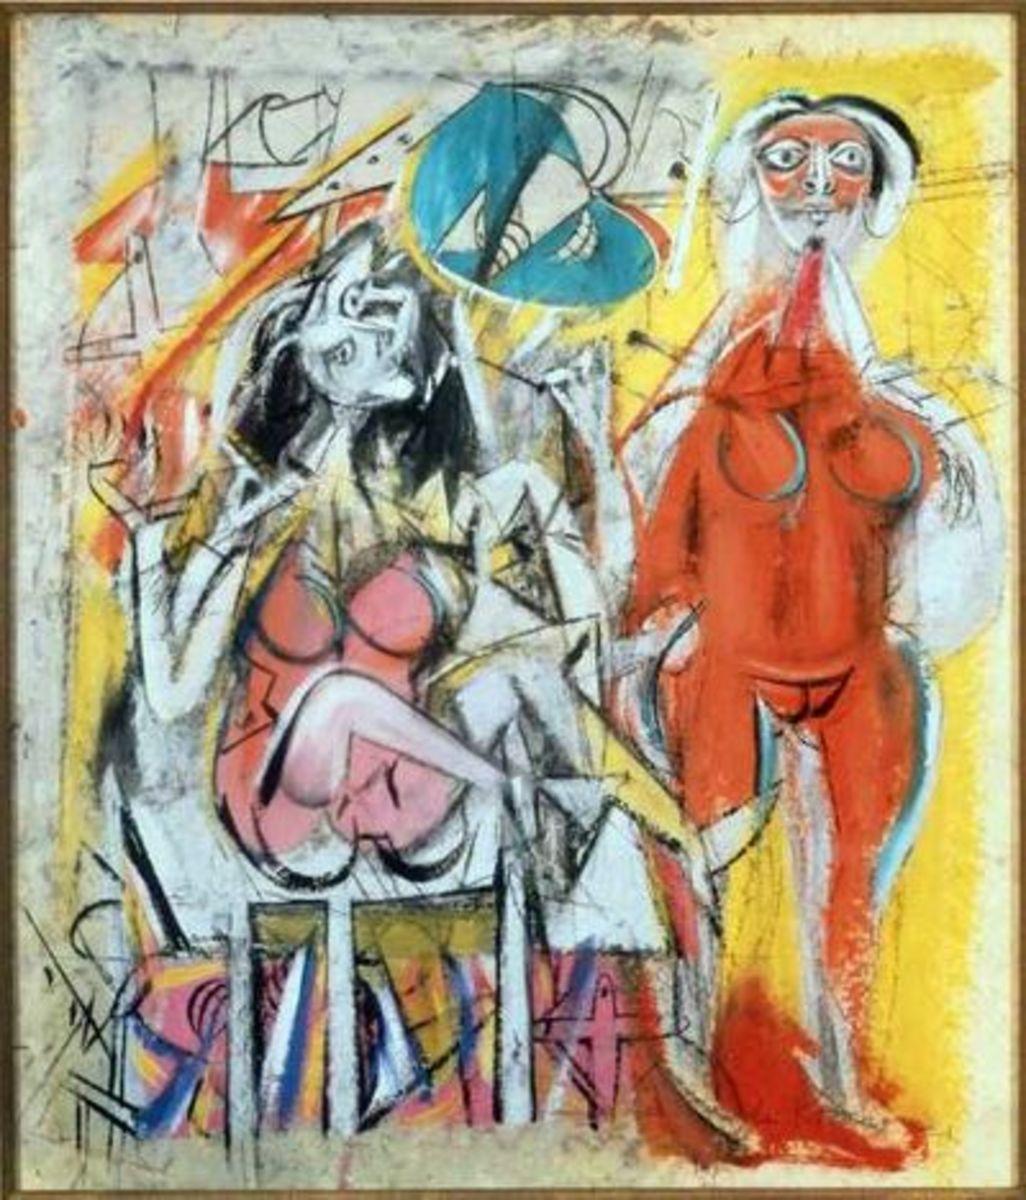 Untitled (1947)